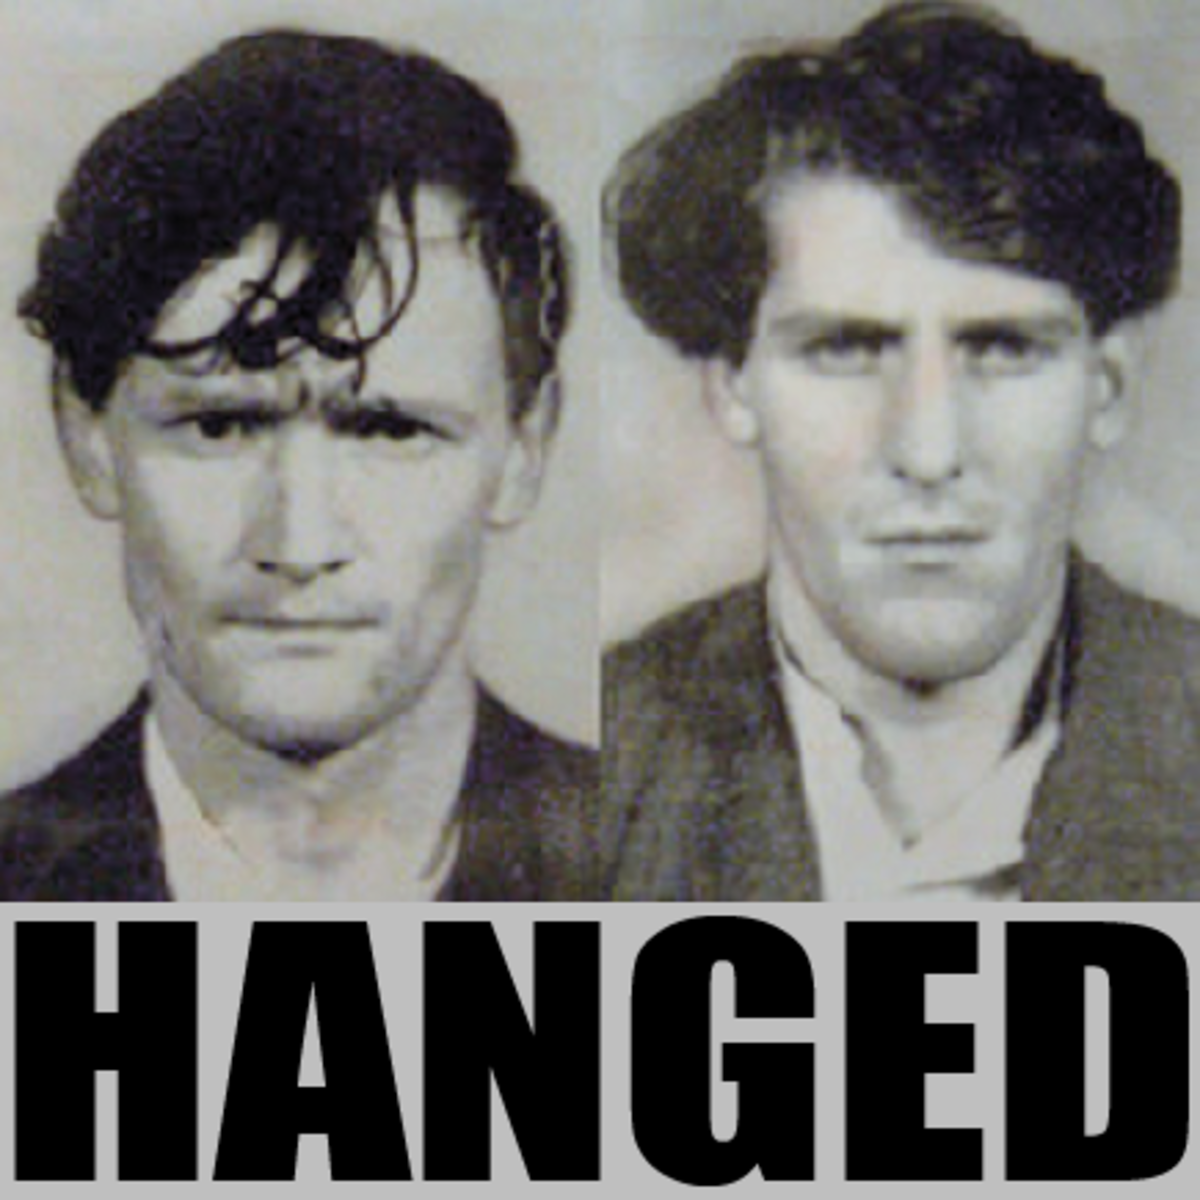 Gwynne Evans & Peter Allen: The Last People to be Hanged in the UK